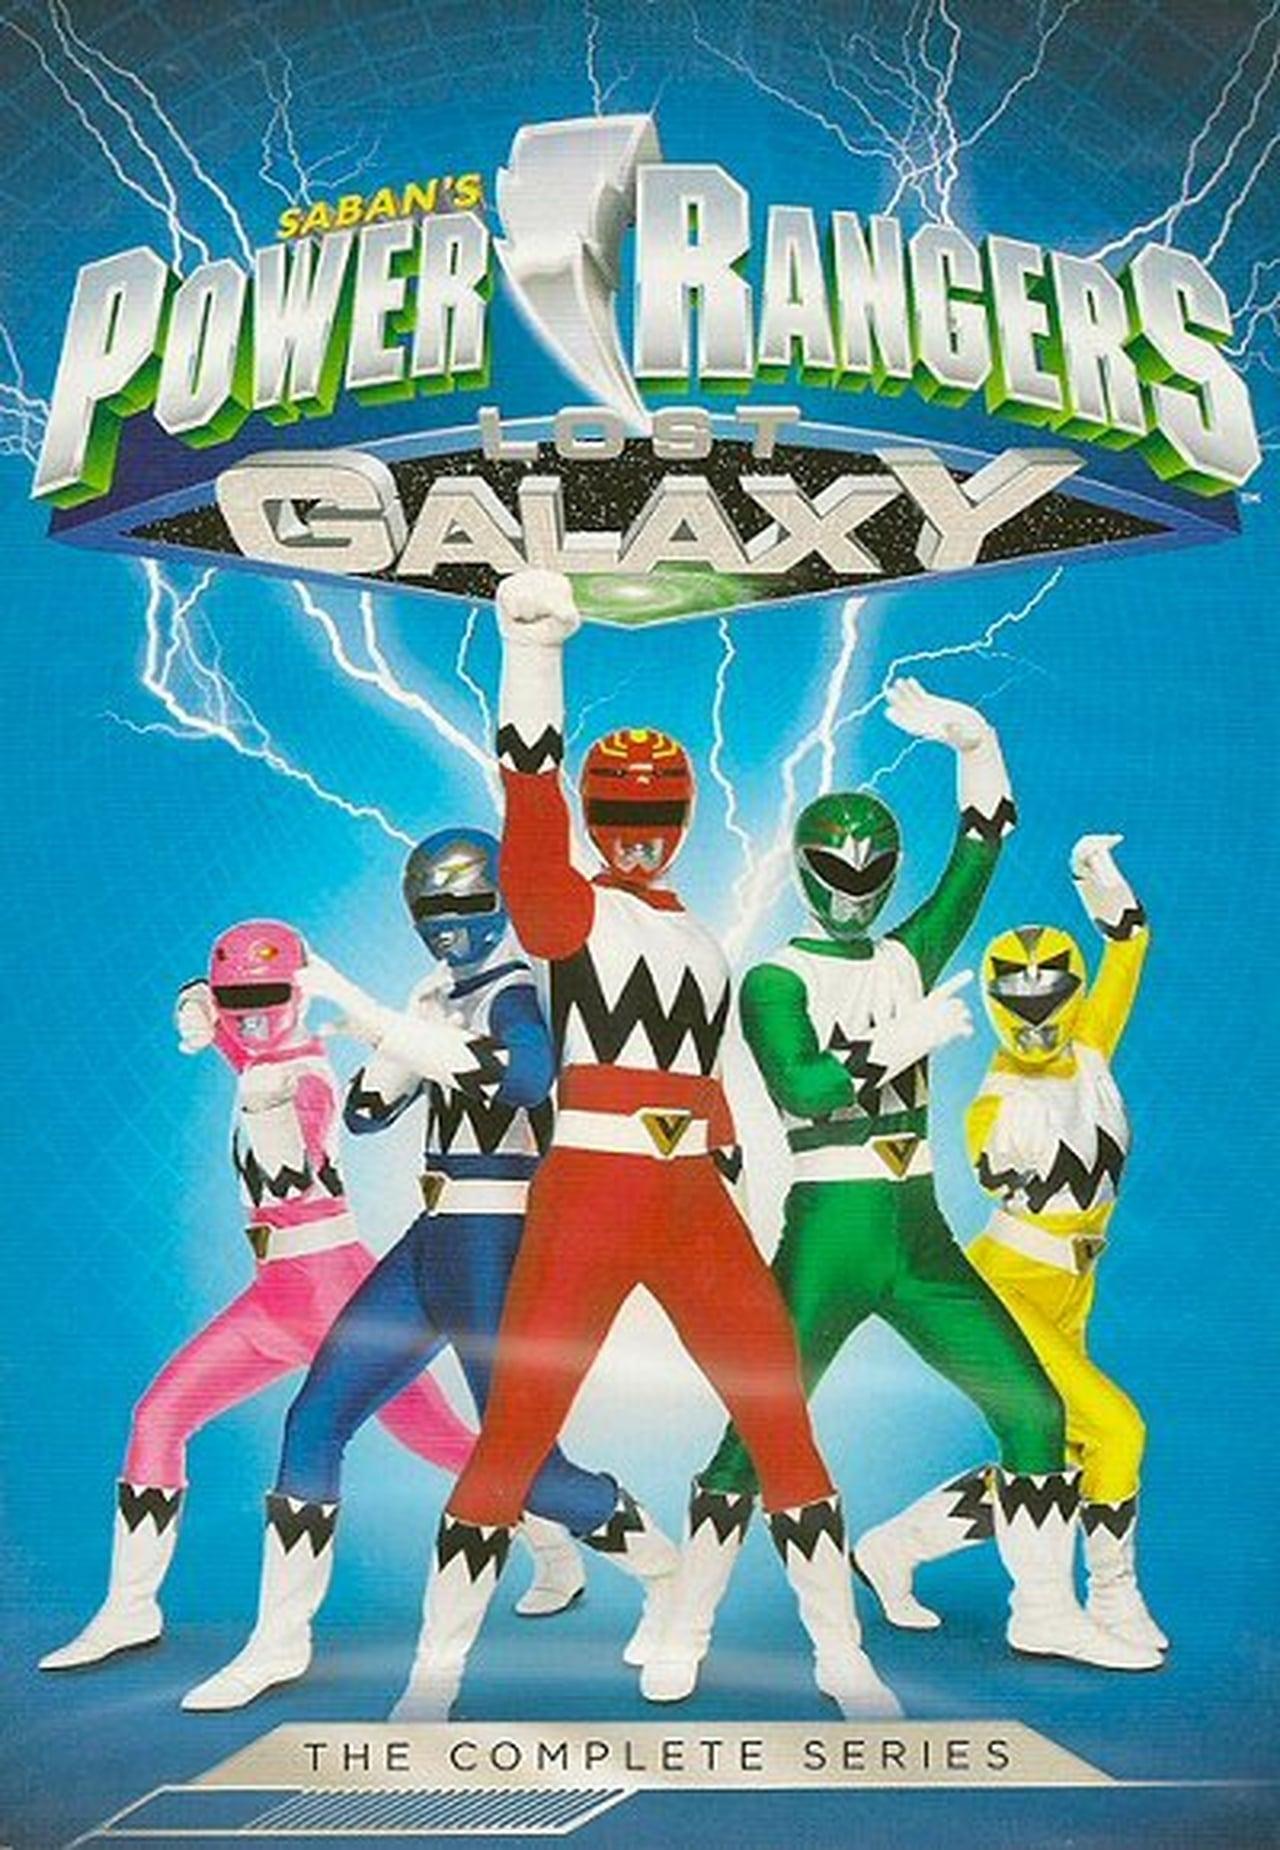 Power Rangers Season 7 (1999) putlockers cafe